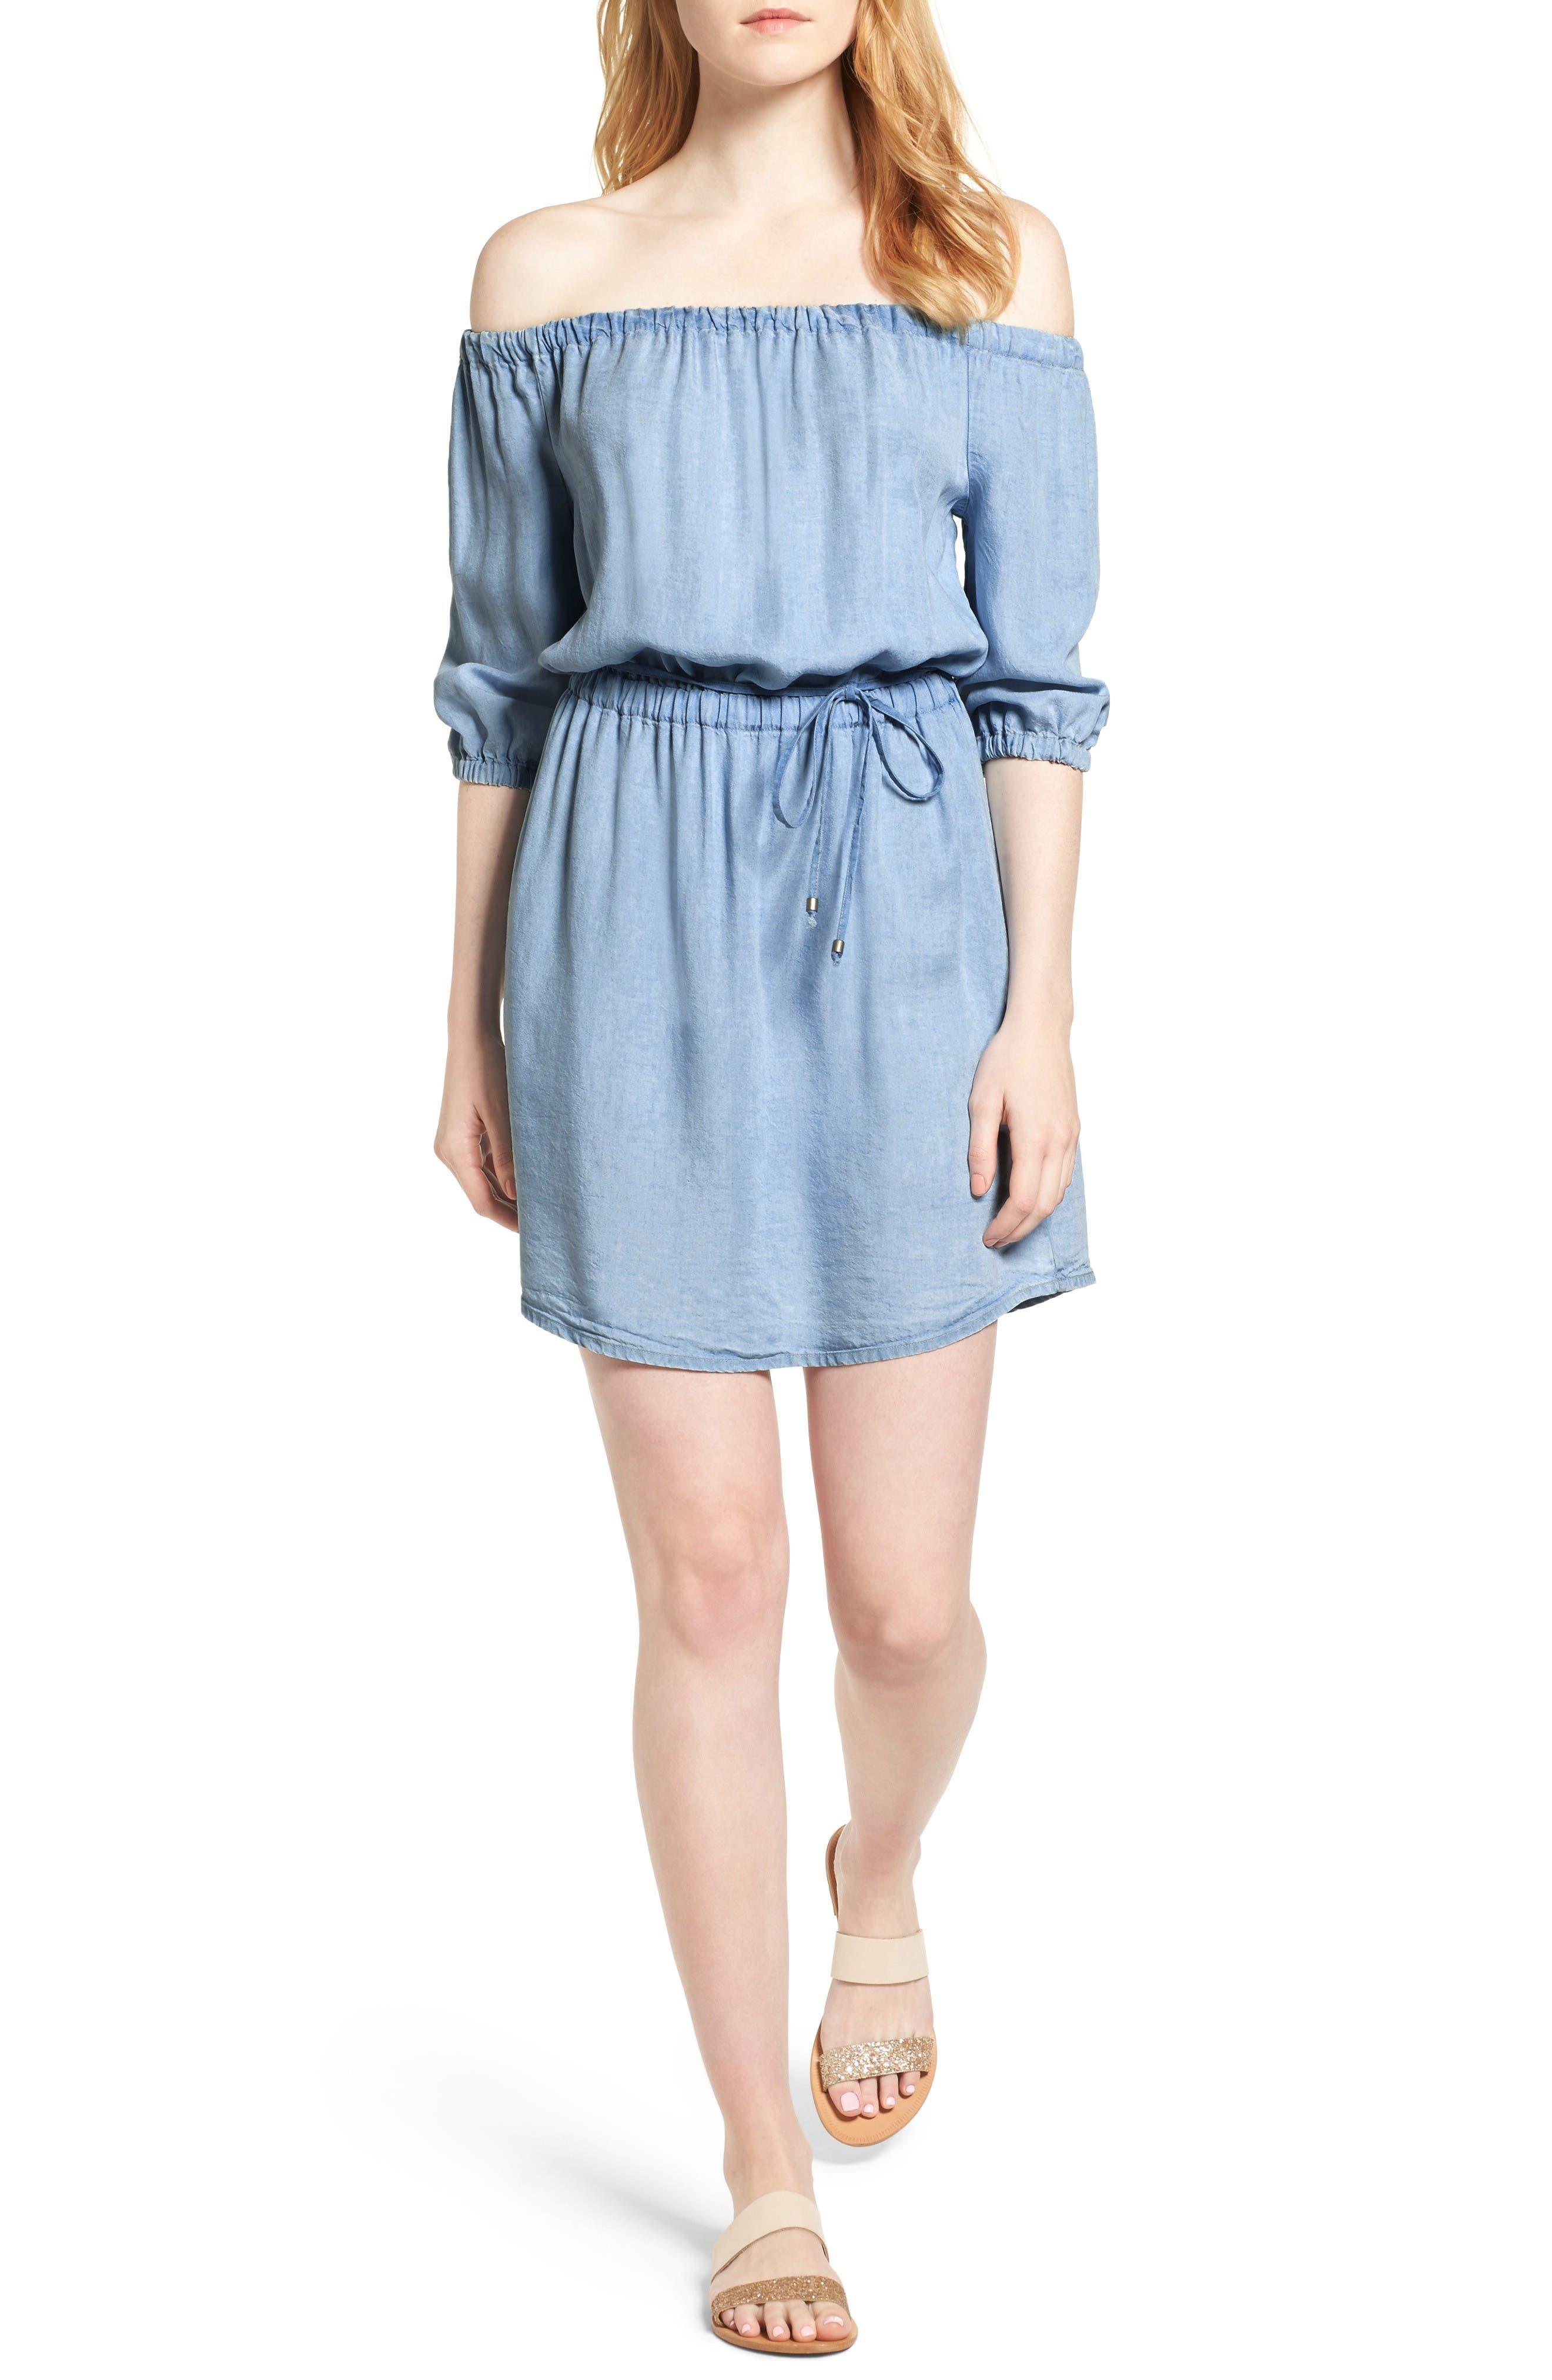 Alternate Image 1 Selected - Splendid Off the Shoulder Blouson Dress